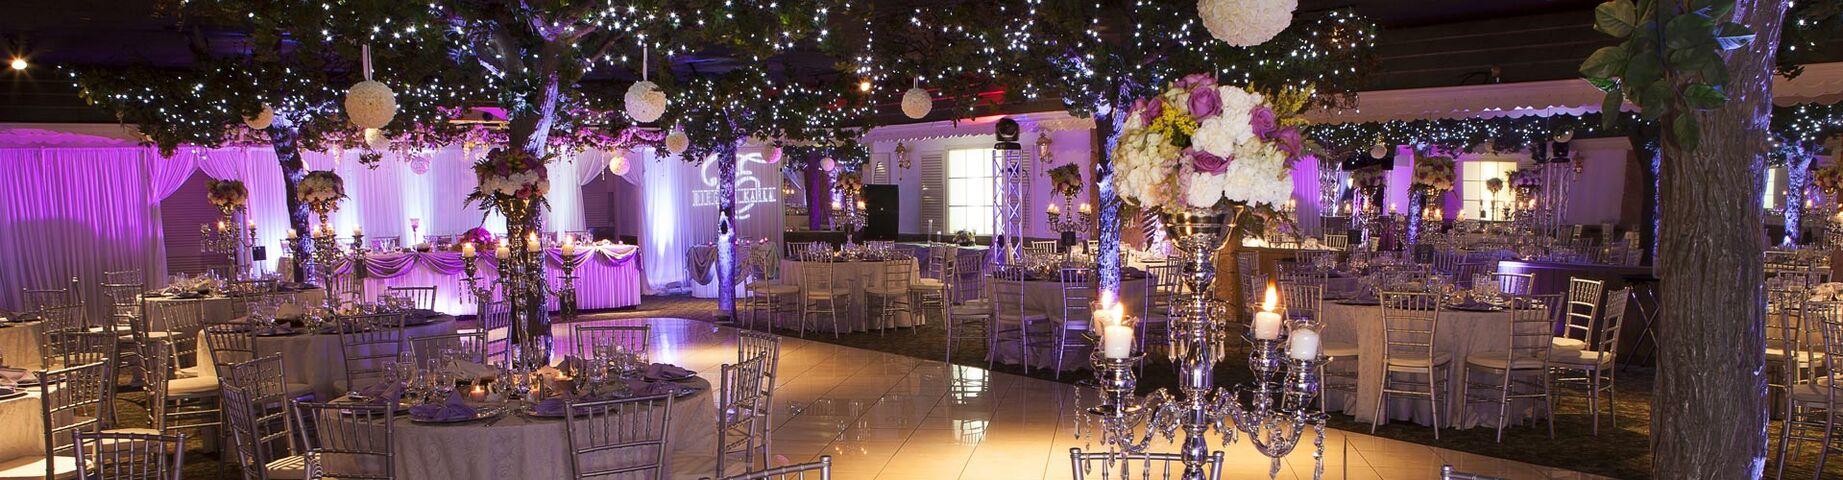 Diamond Garden Banquets Chicago Il